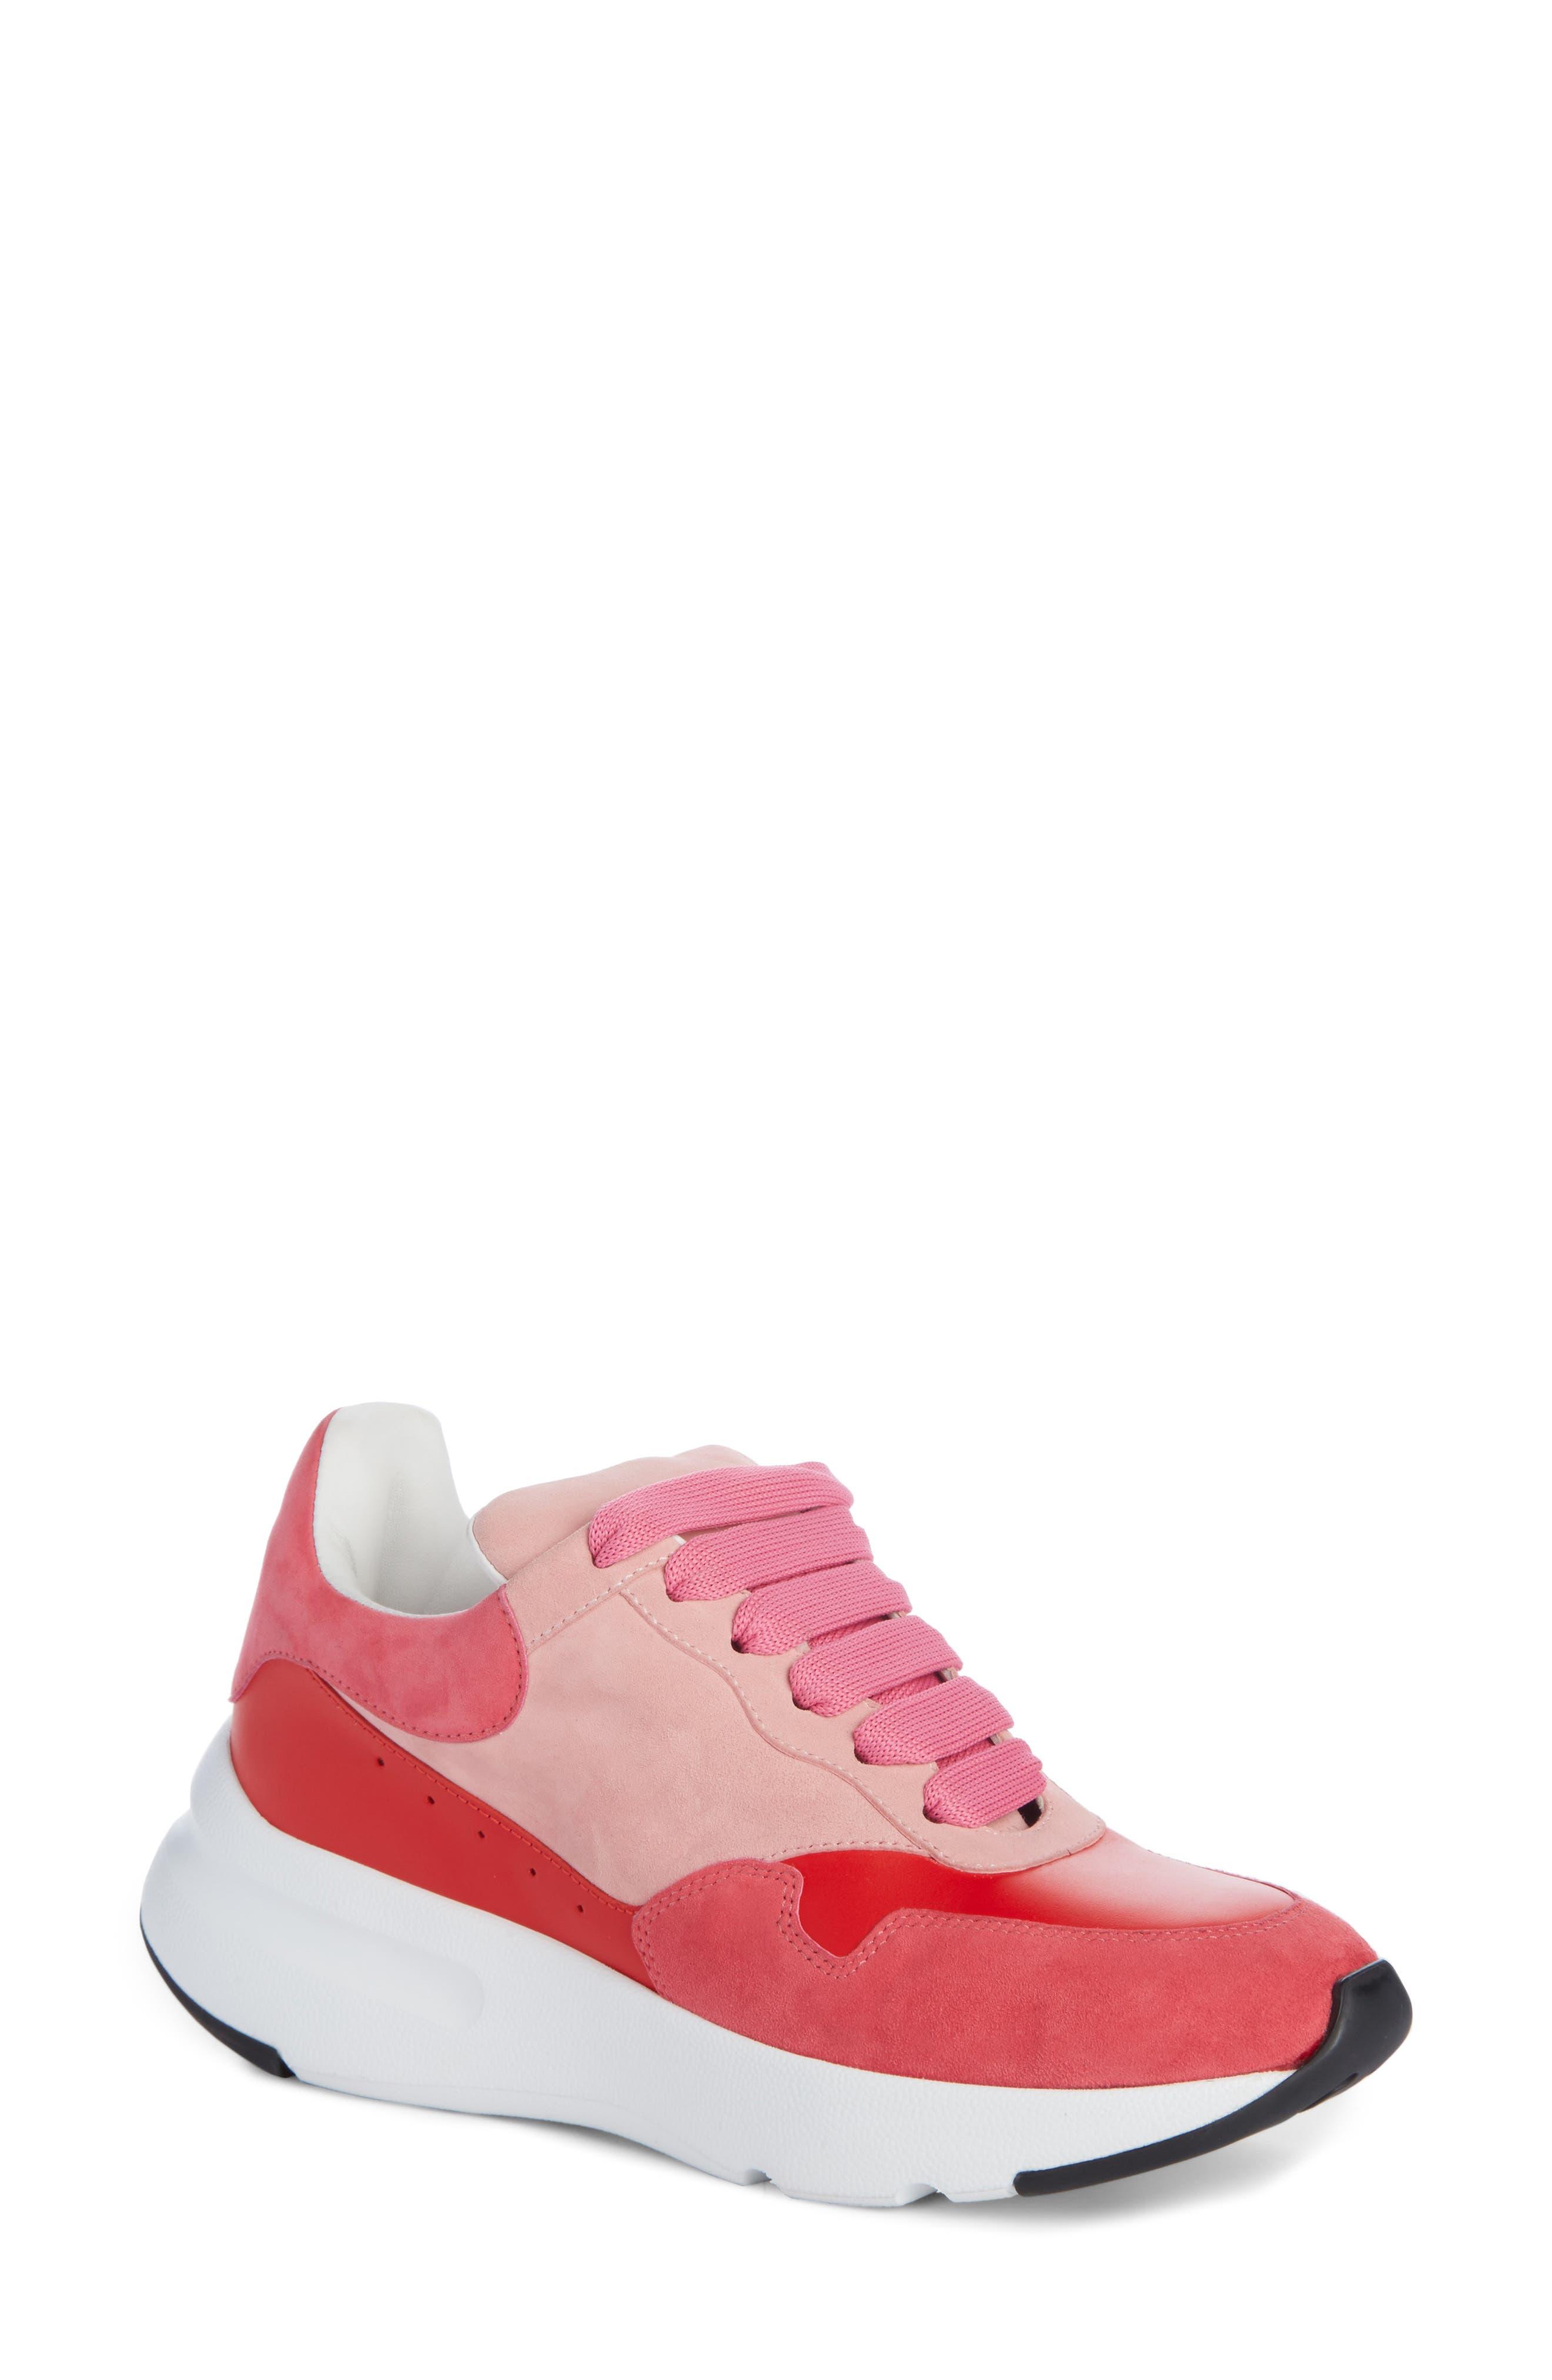 Alternate Image 1 Selected - Alexander McQueen Runner Lace-Up Sneaker (Women)